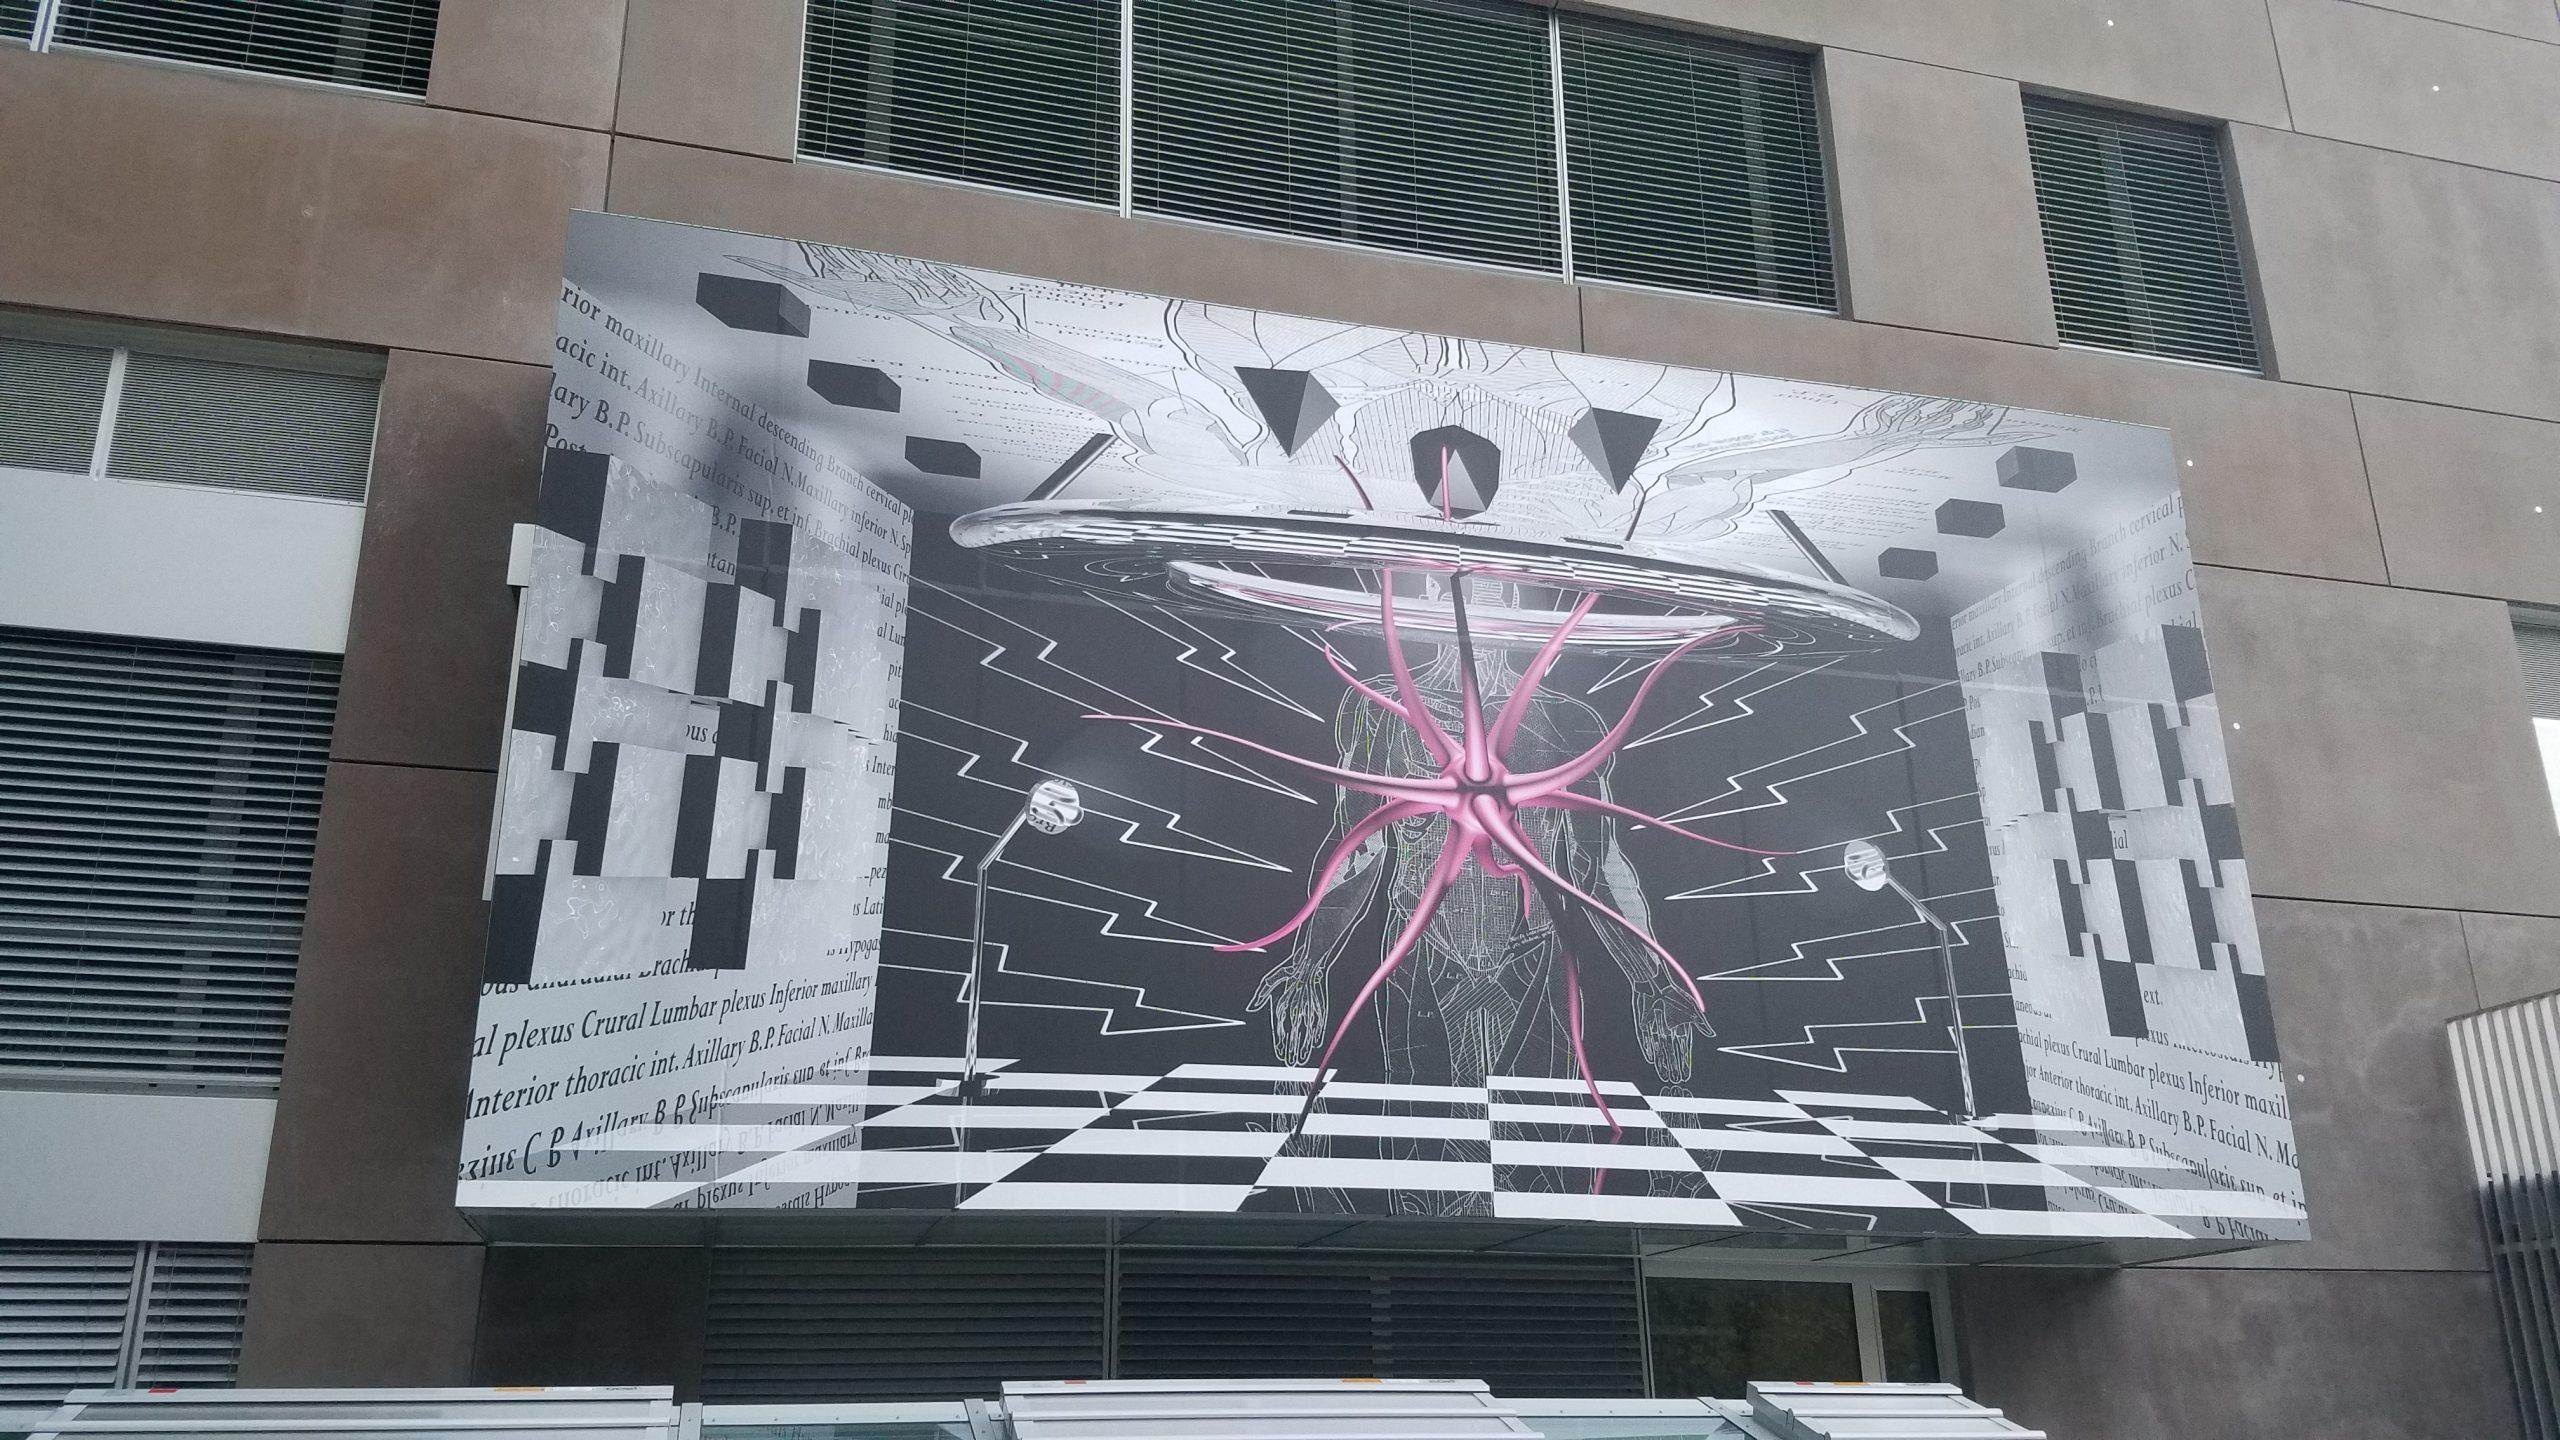 Digital Neuron